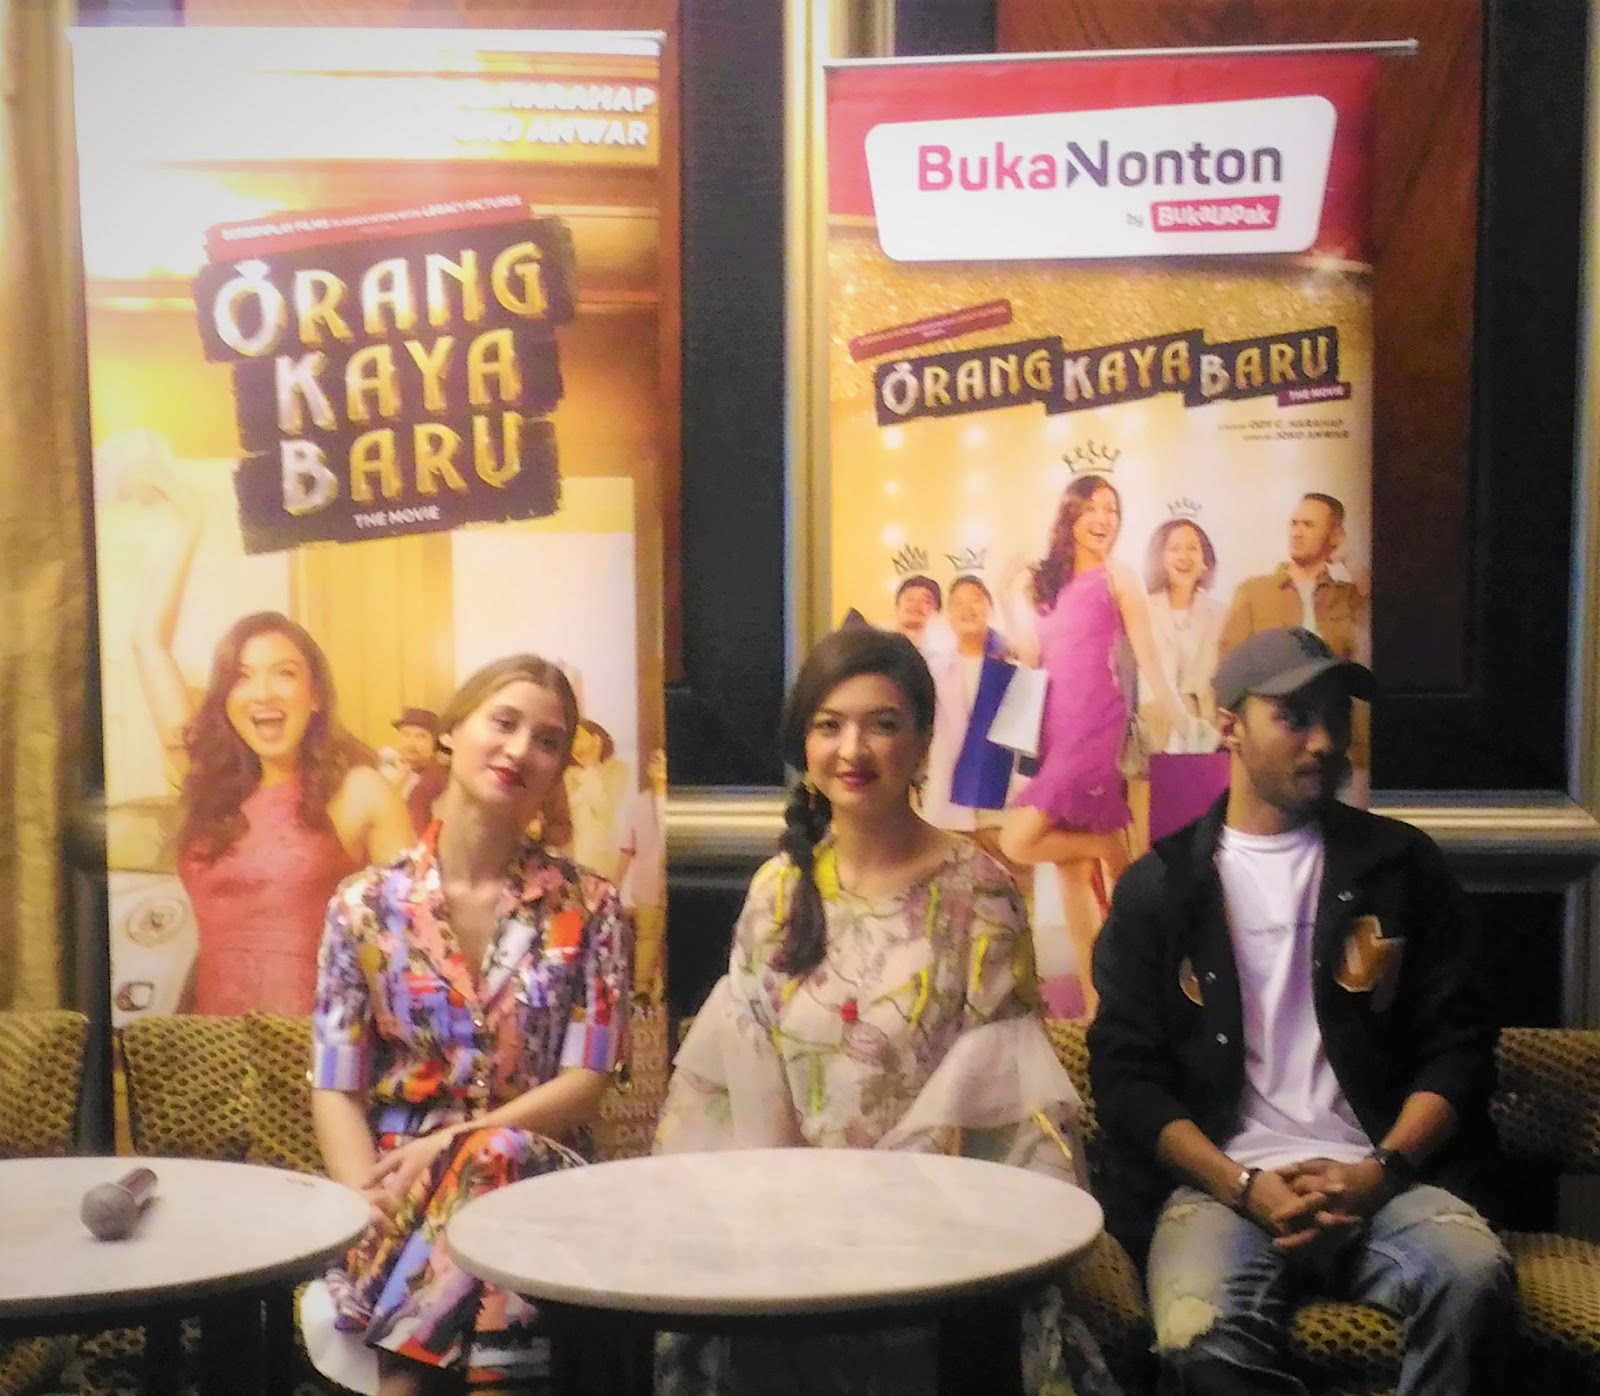 Menggelar Pemutaran Perdana Di Bandung Film Orang Kaya Baru Disambut Antusias Penonton